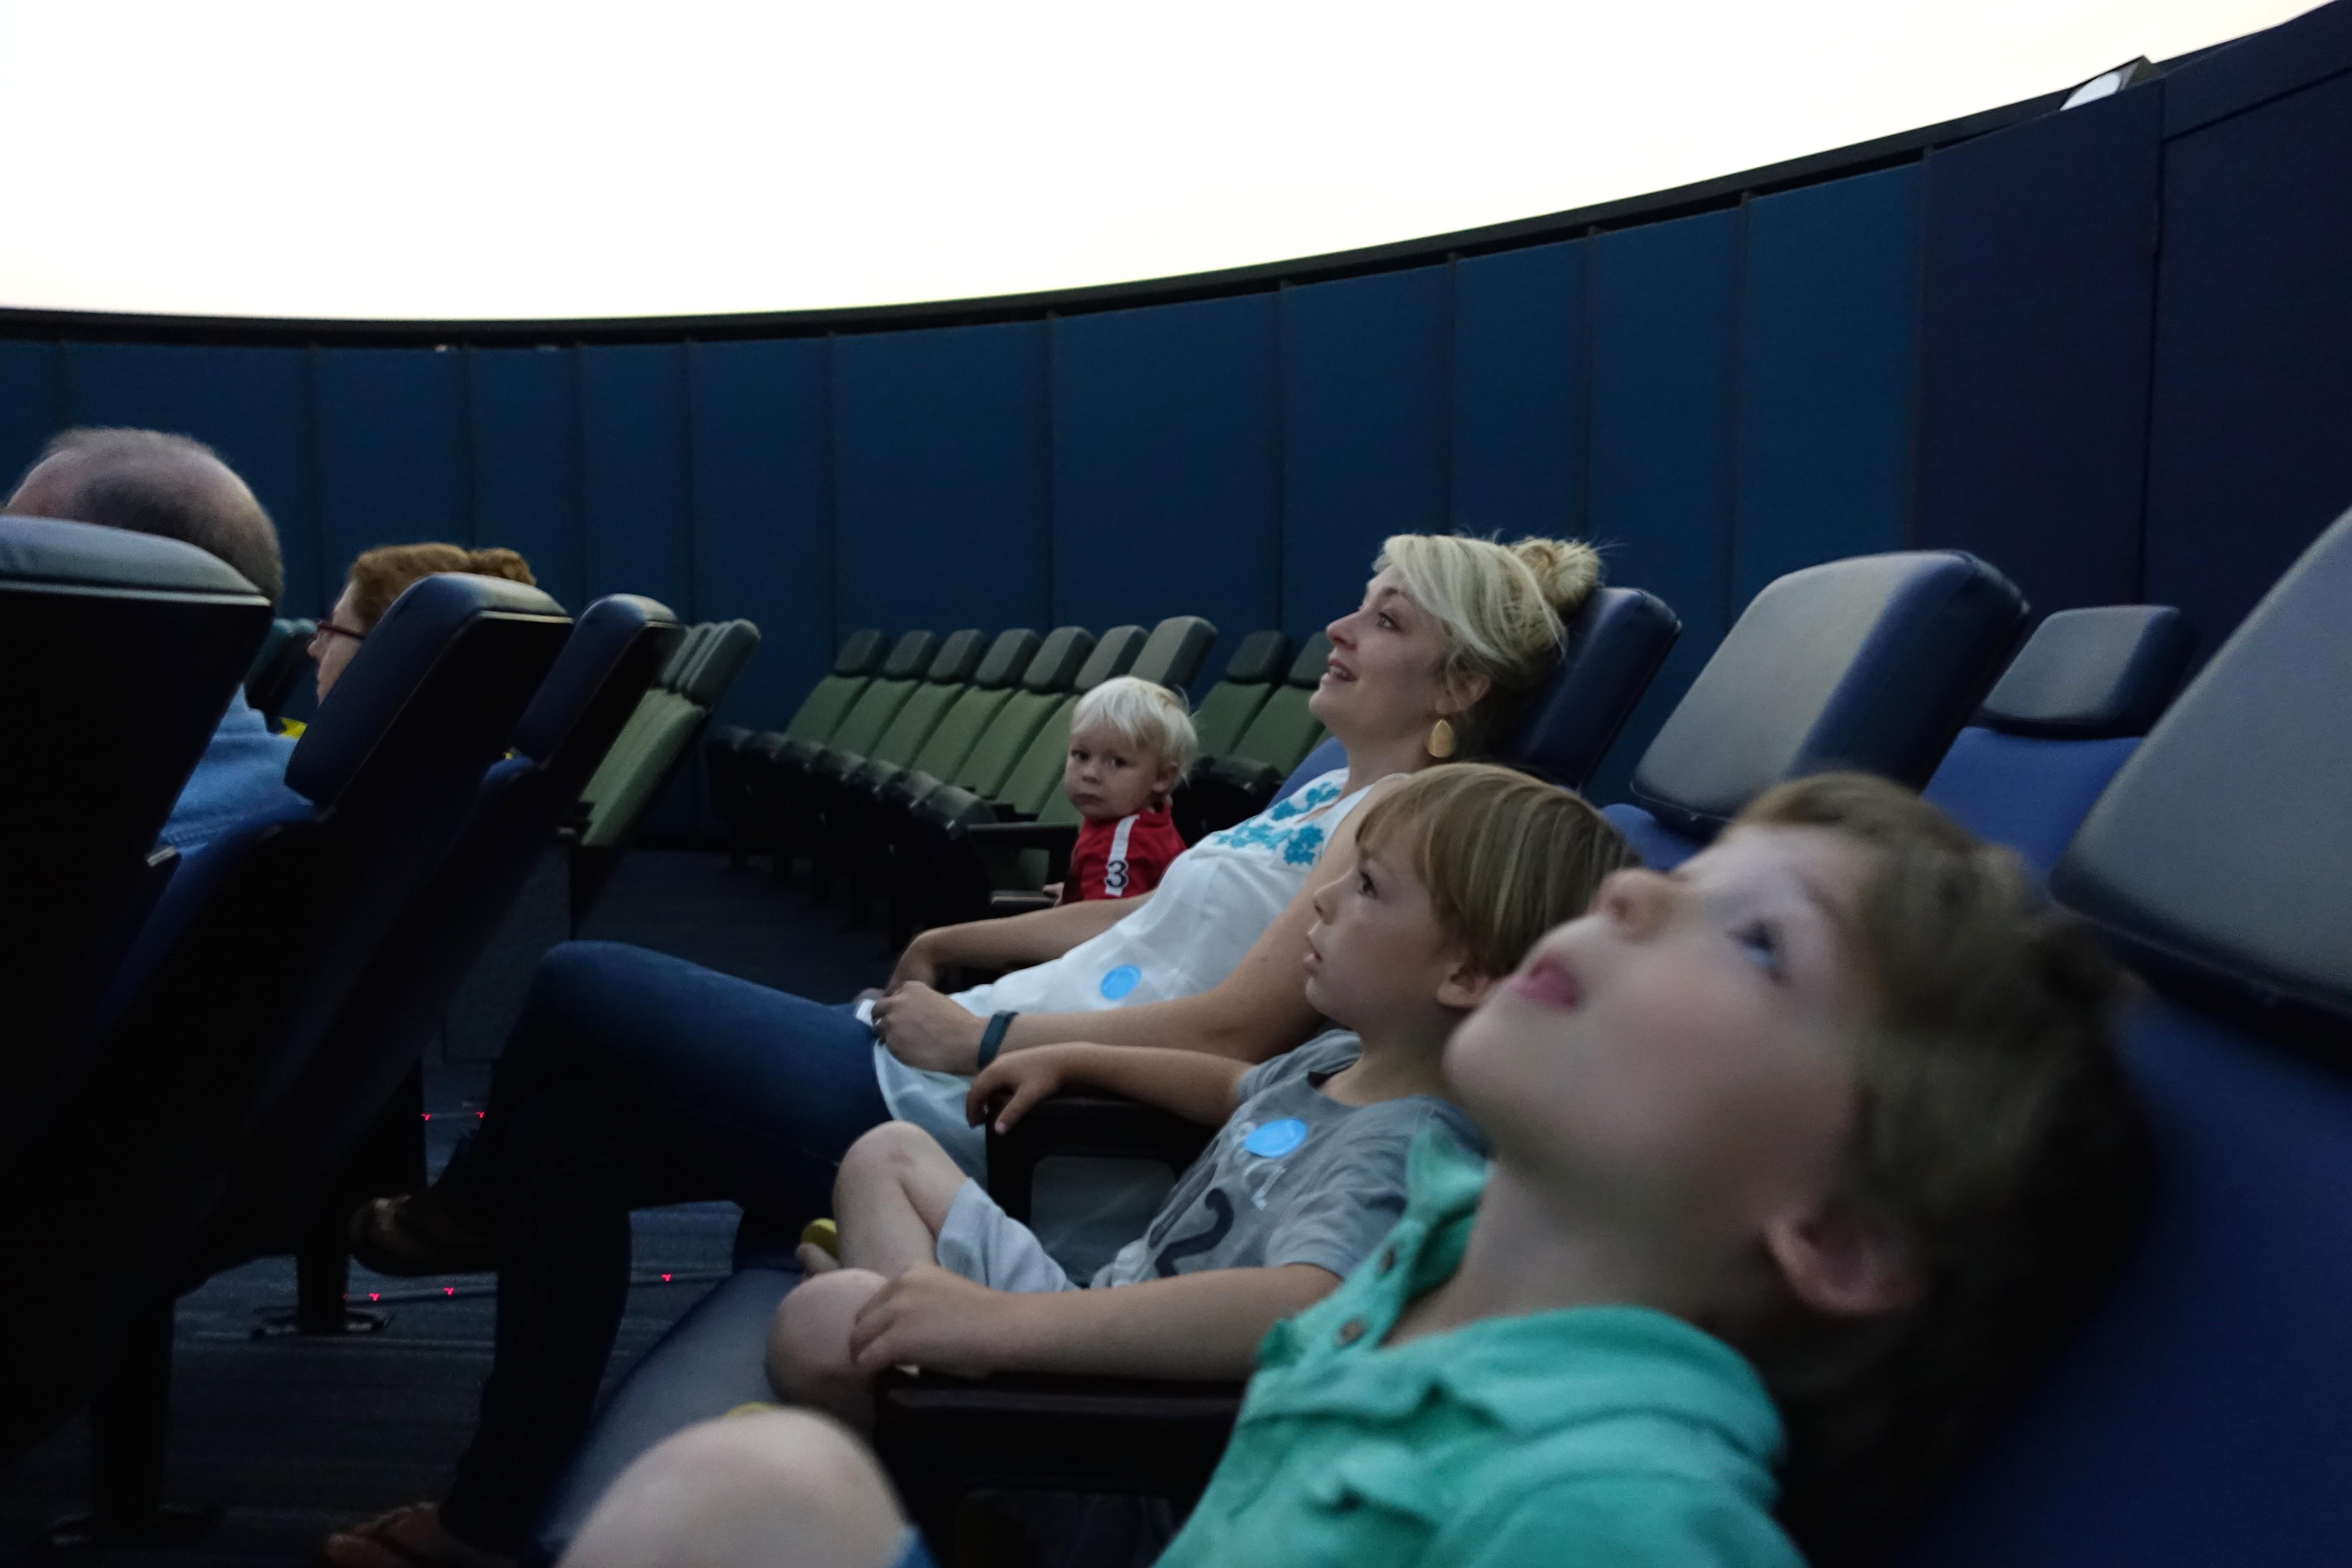 Star gazing at the planetarium